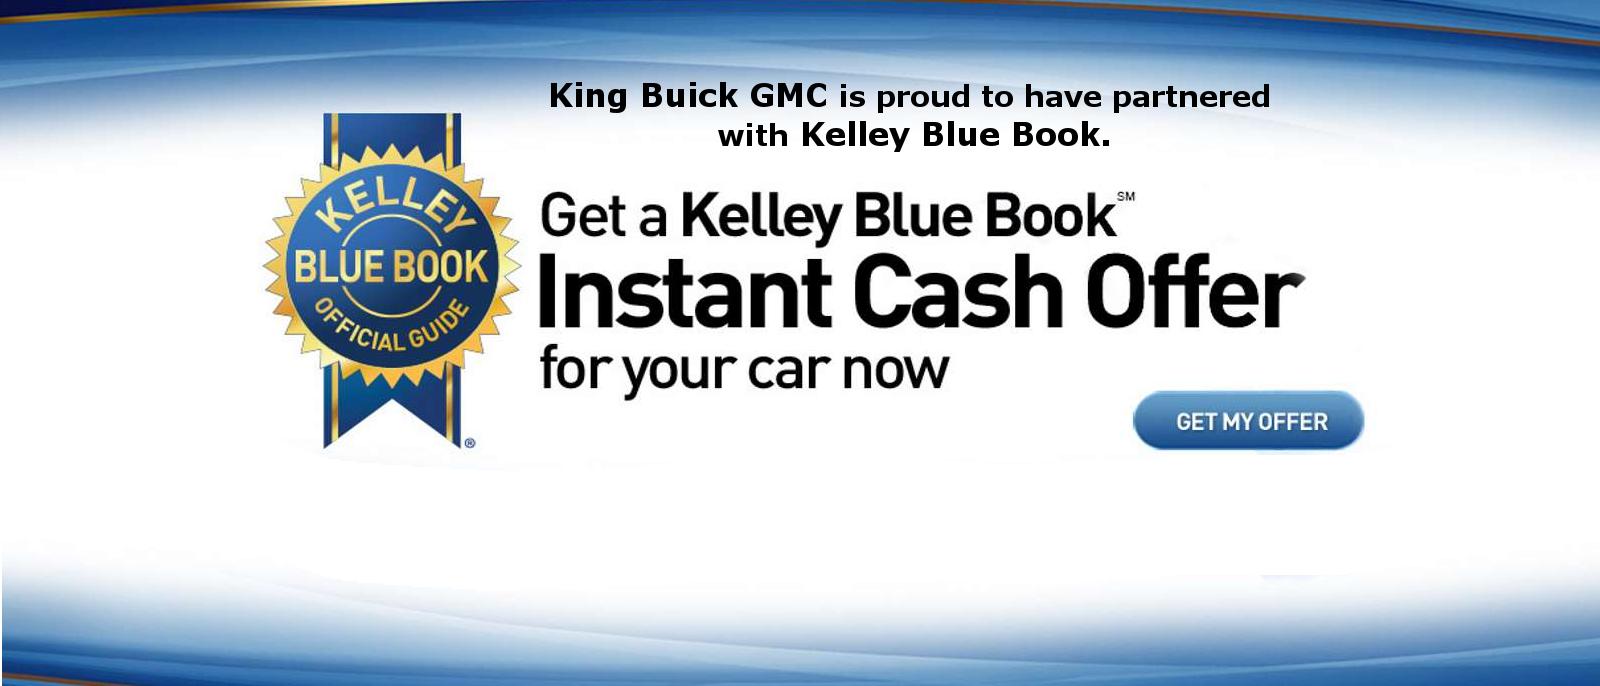 King Buick GMC KBB